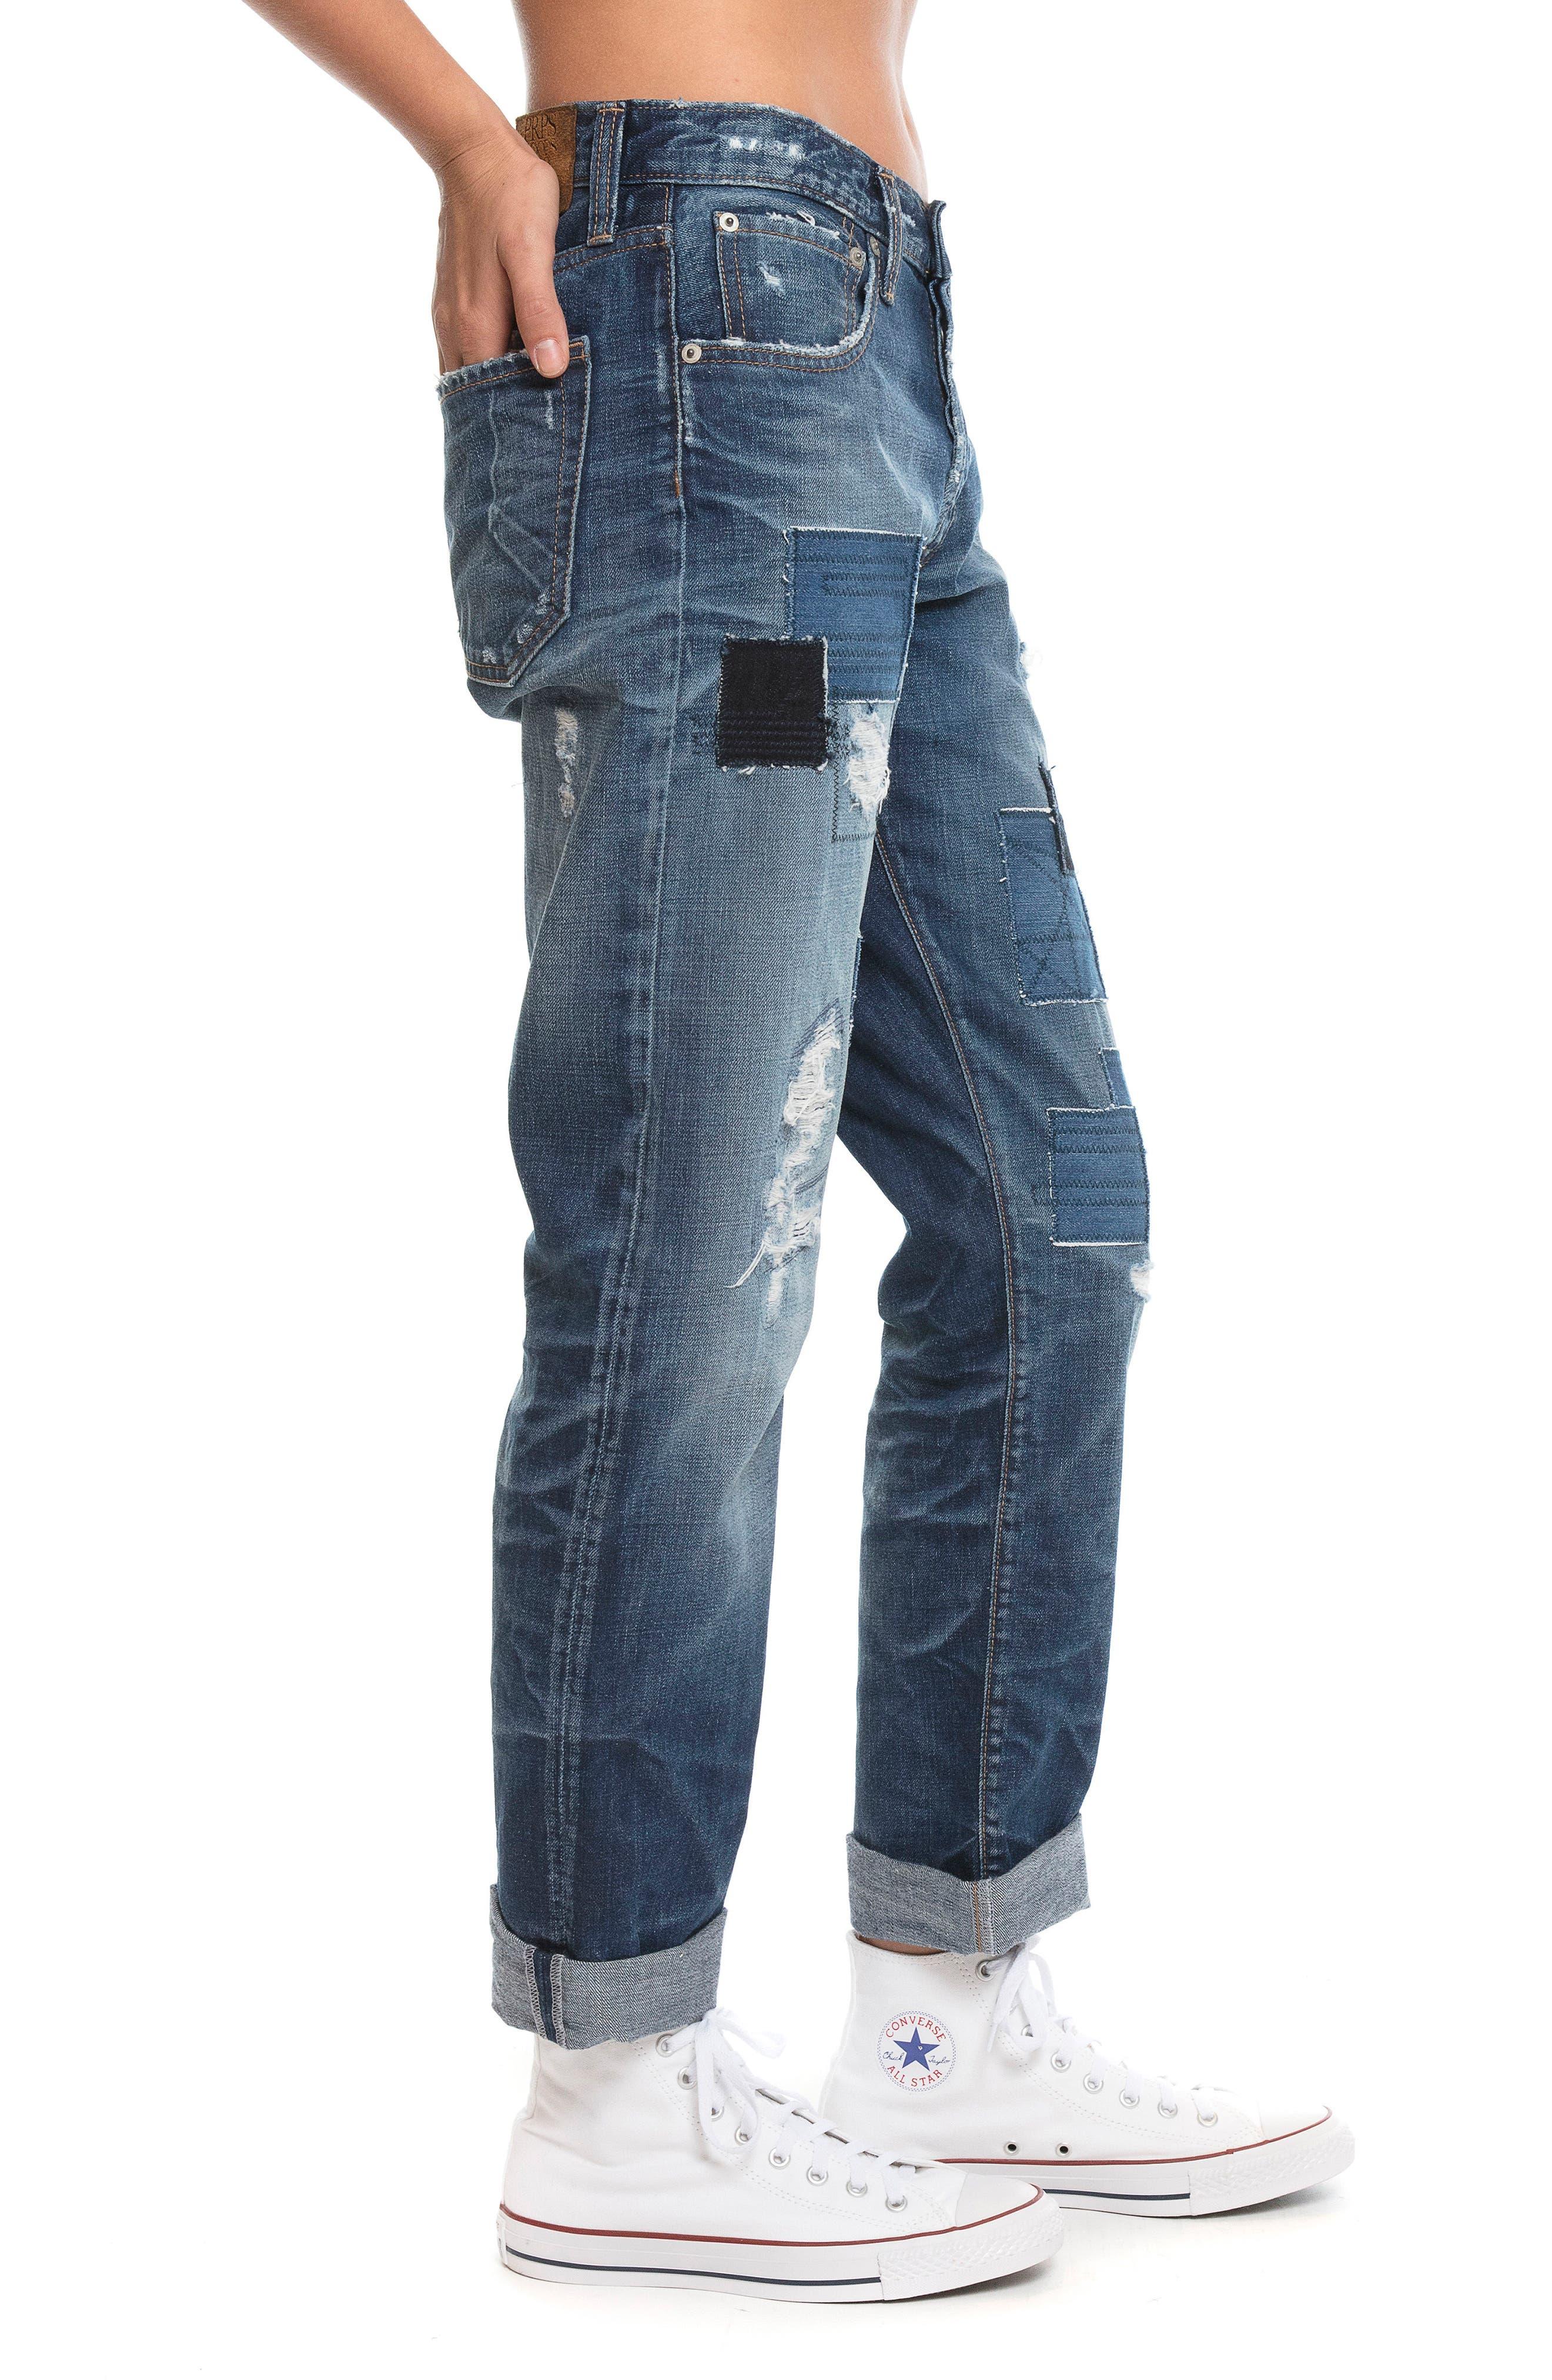 El Camino - Patch It Boyfriend Jeans,                             Alternate thumbnail 4, color,                             INDIGO